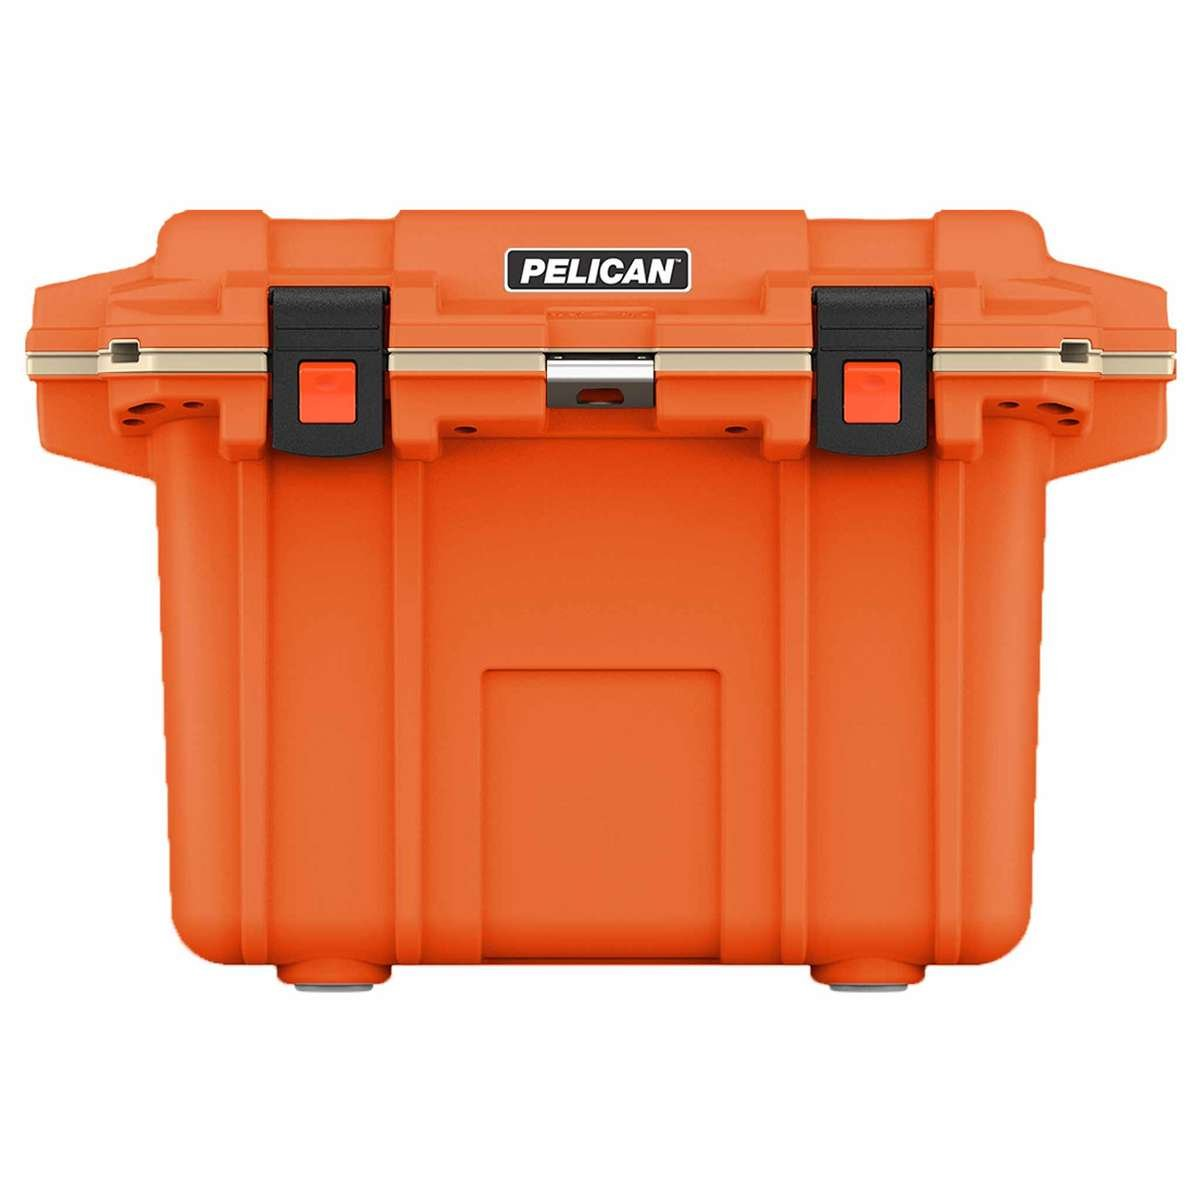 30QT Pelican Elite Cooler Orange/Tan